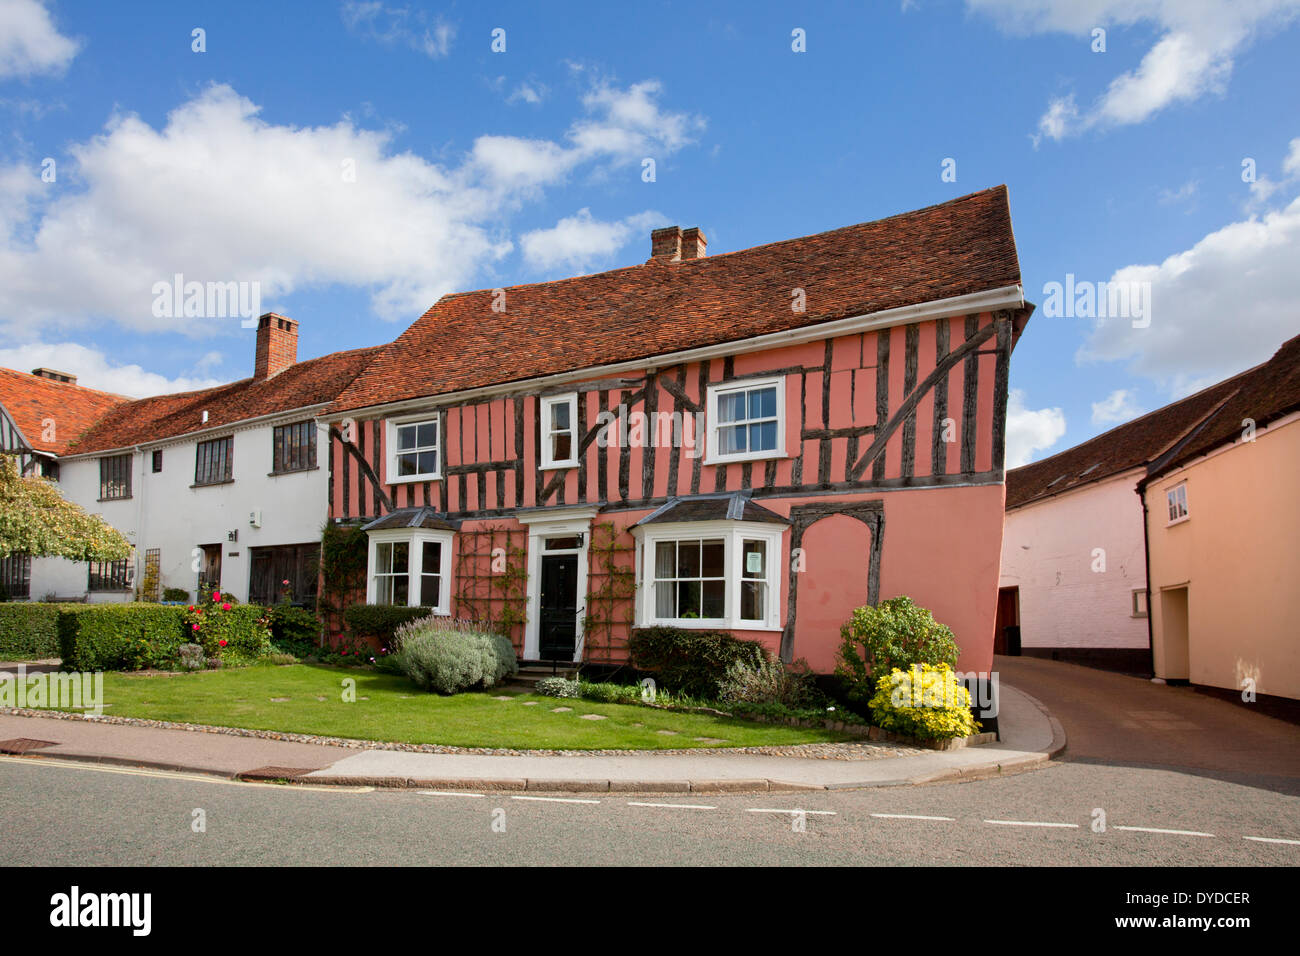 The village of Lavenham. - Stock Image